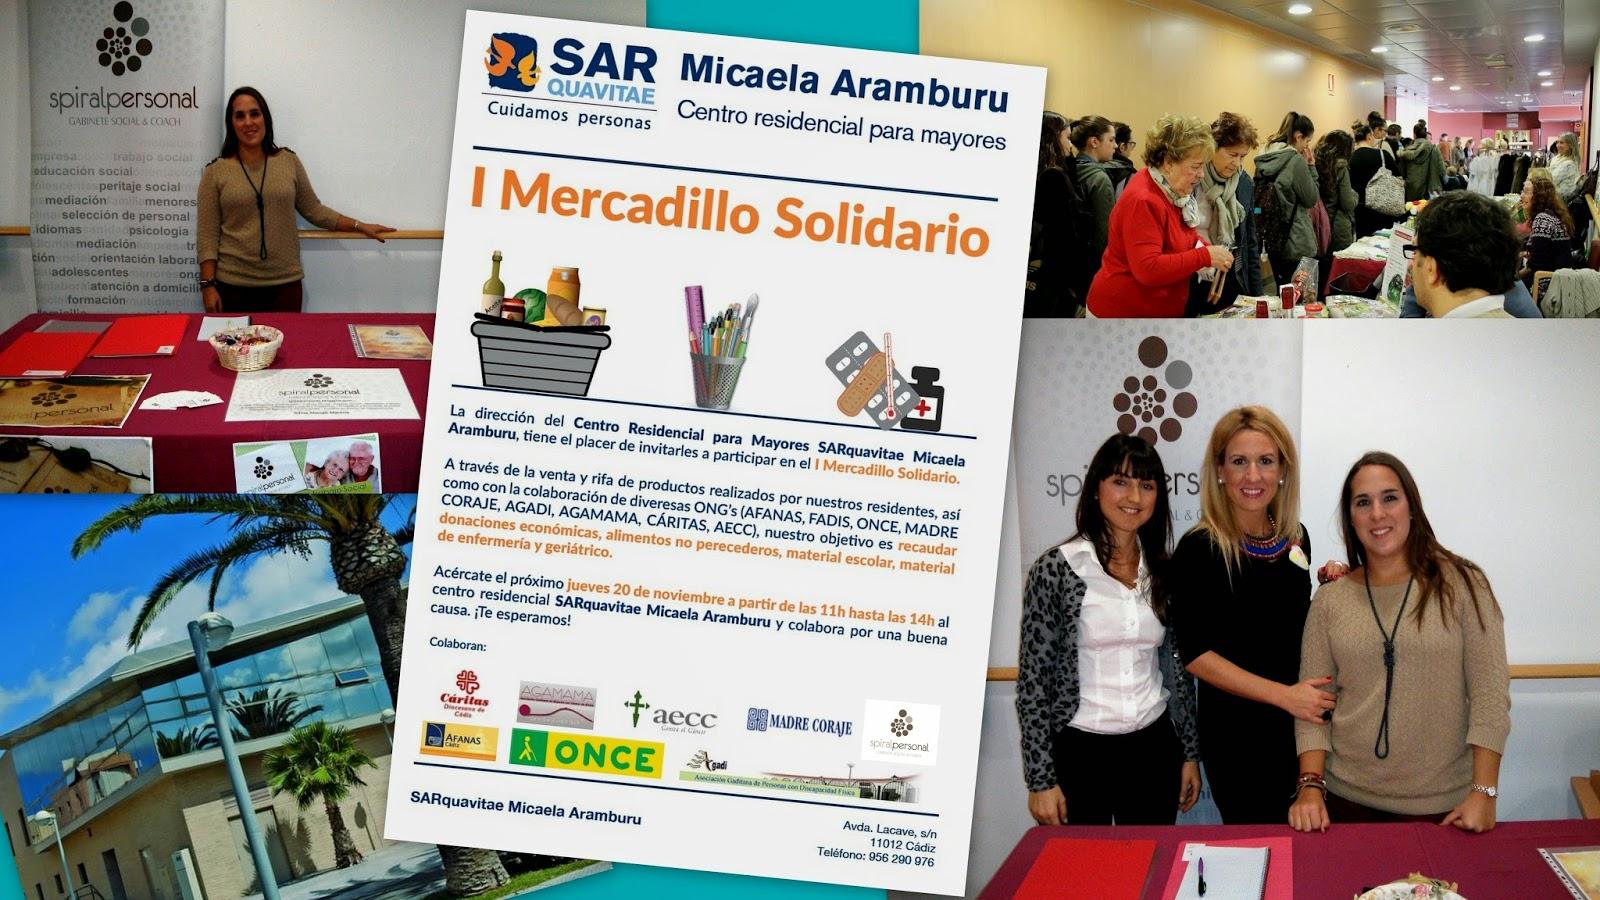 Spiral Personal en el I Mercadillo Solidario de Micaela Aramburu